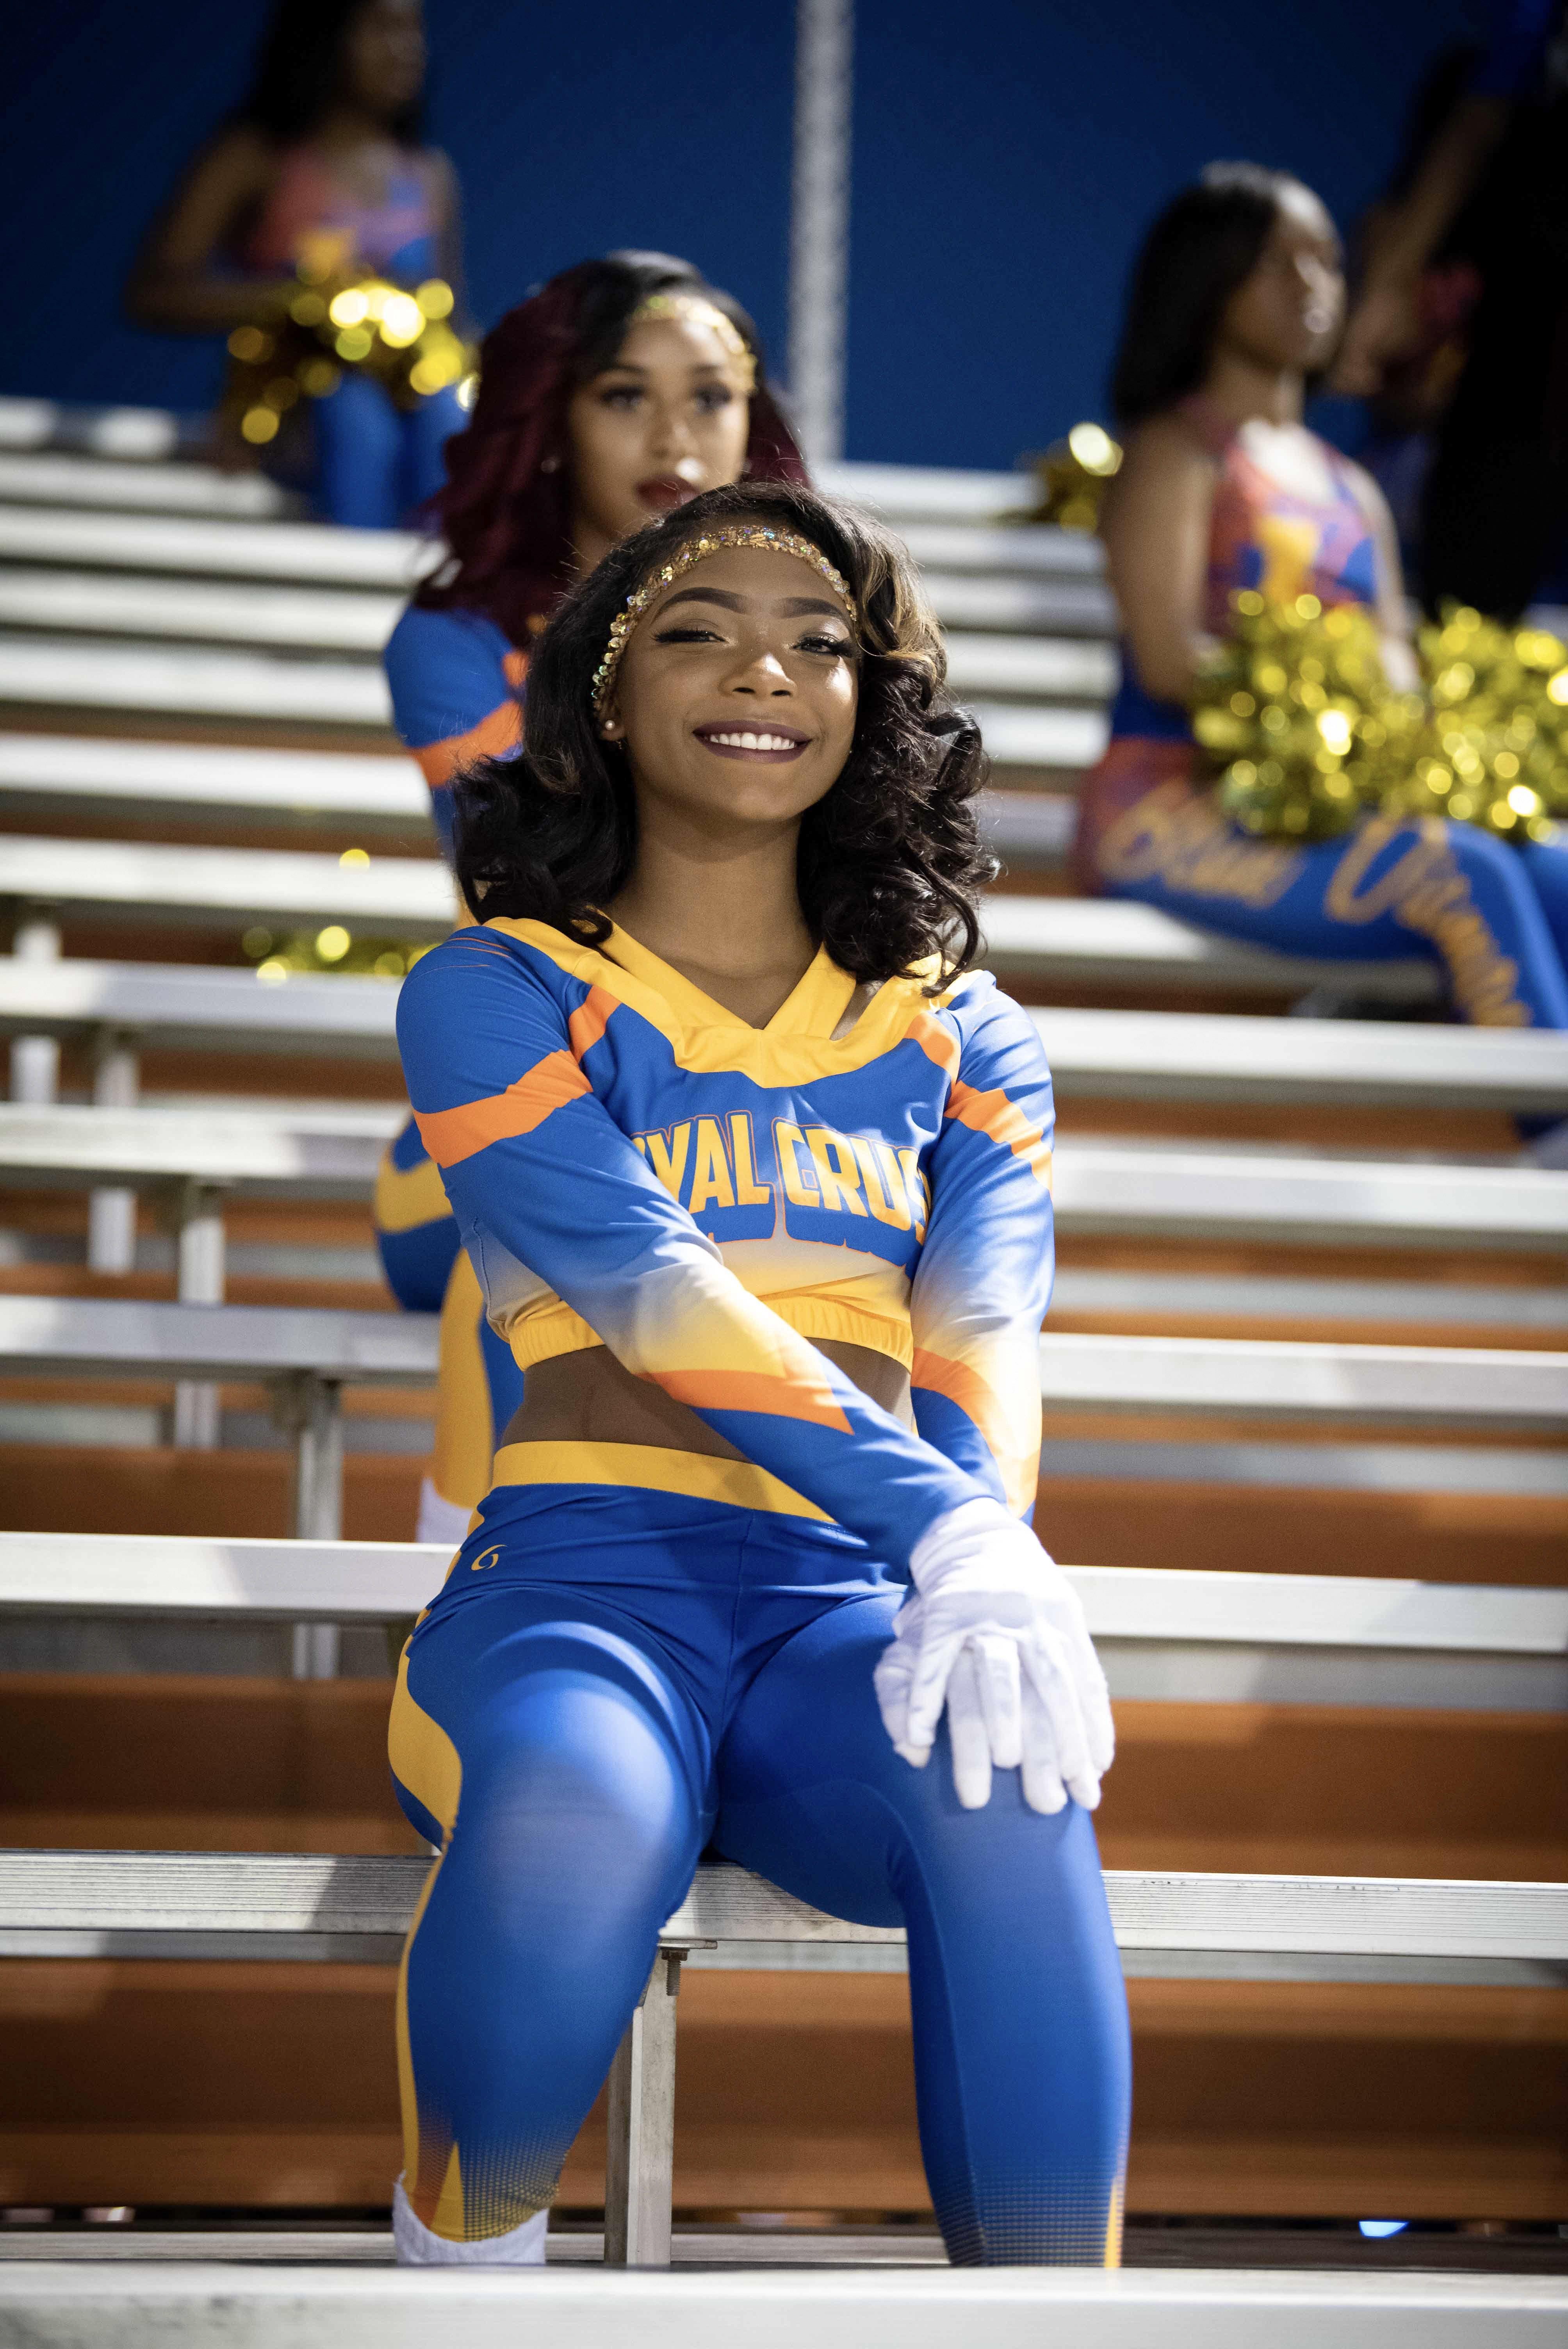 LandryWalker Royal Crush Cheerleading outfits, Dance